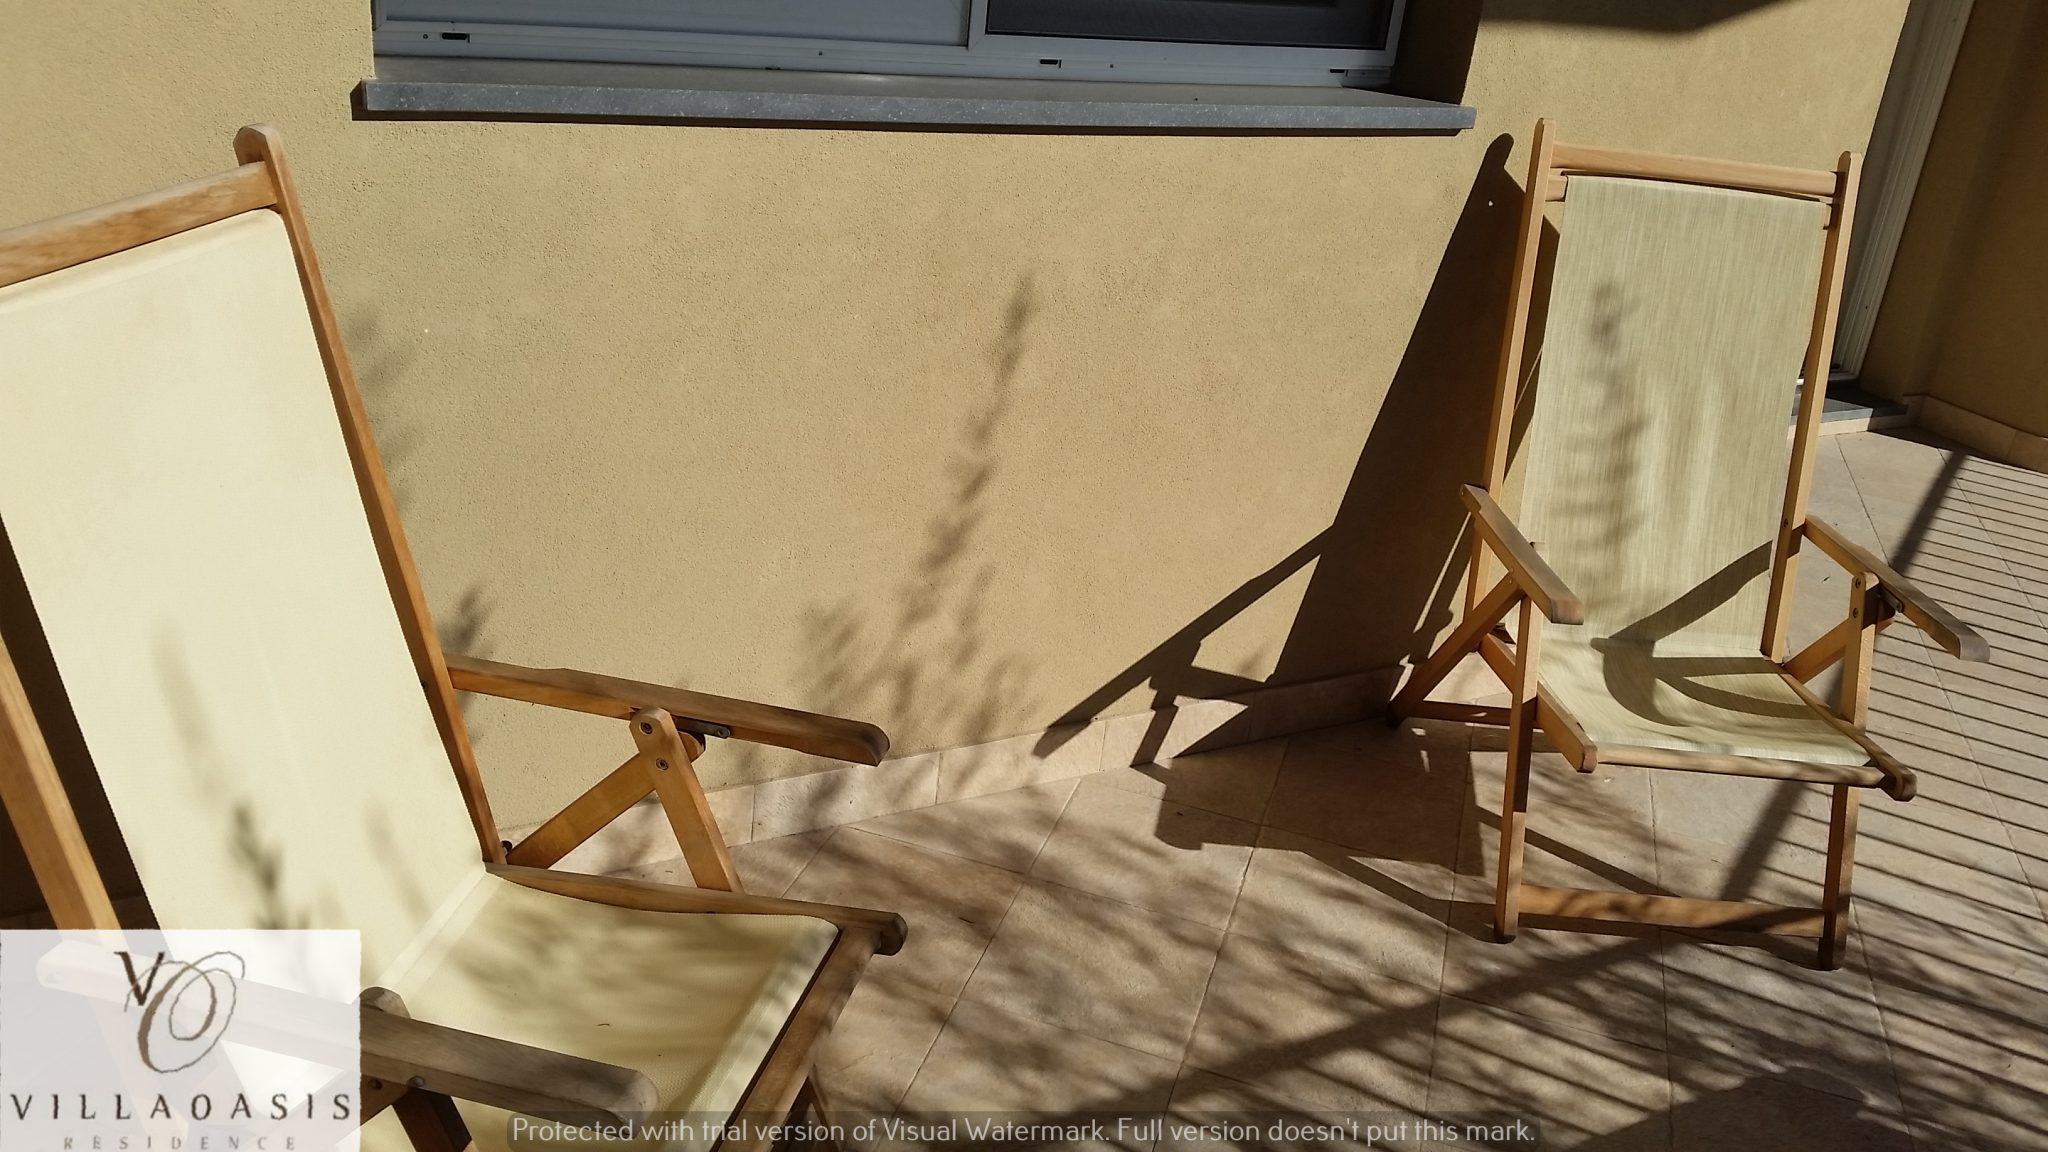 Taormina Family Suite 2 Bedrooms apartment - Taormina Villa